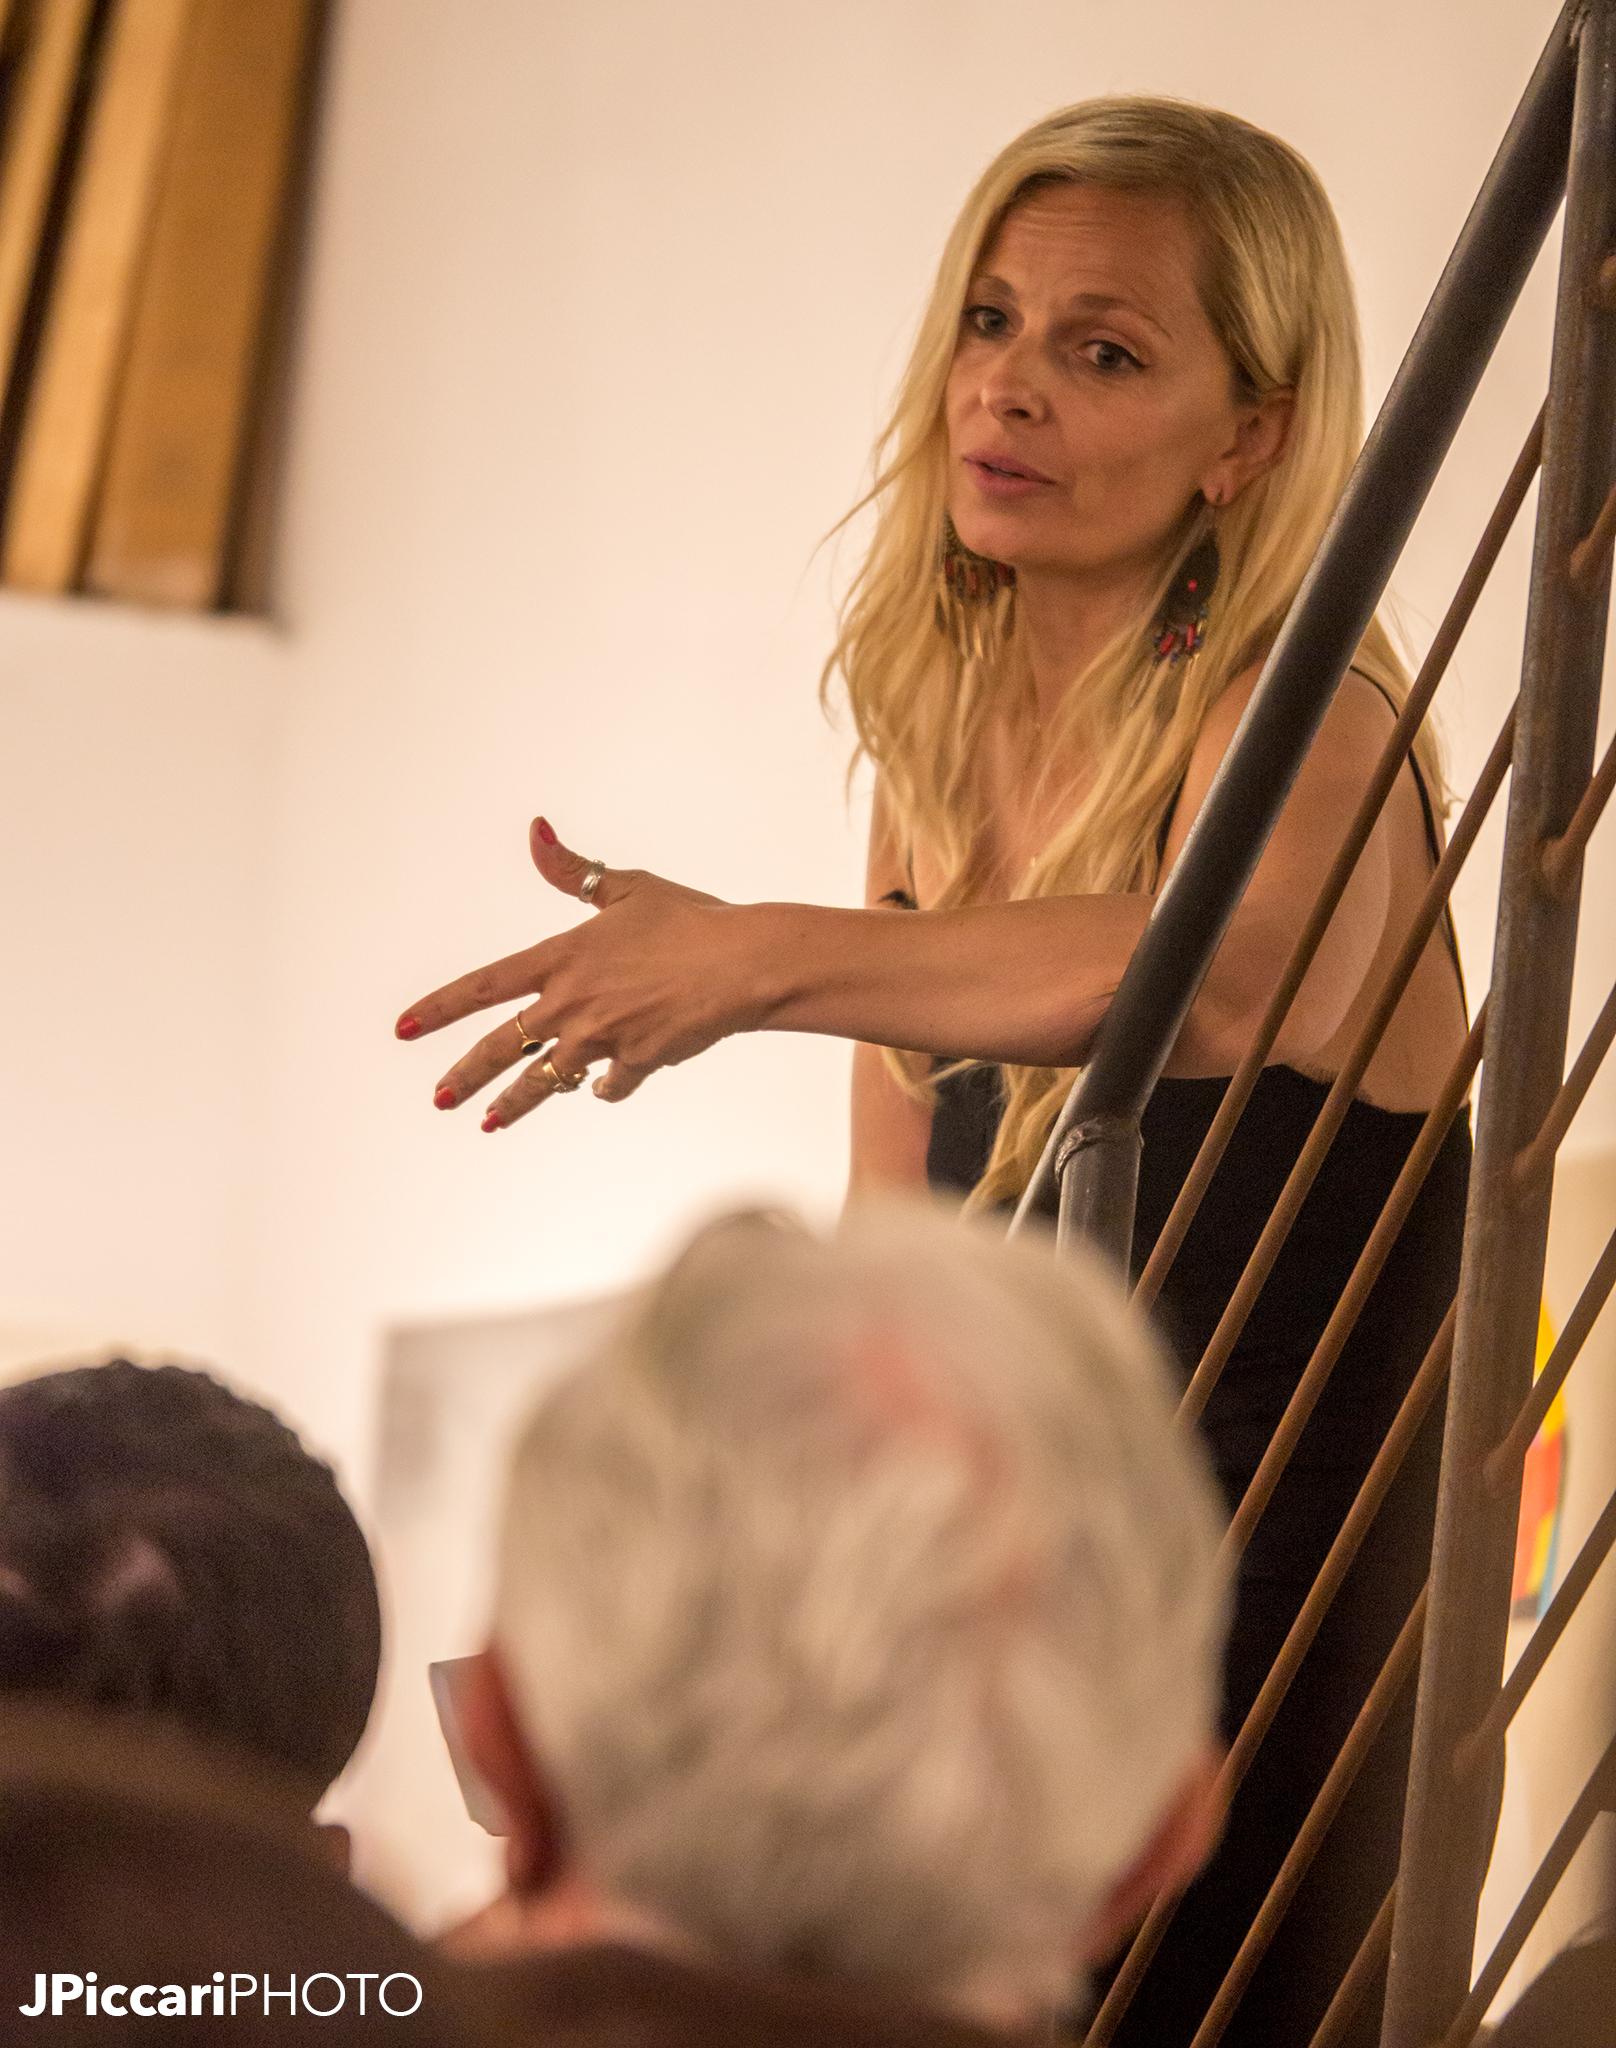 Photographer Gisele Lubsen speaking